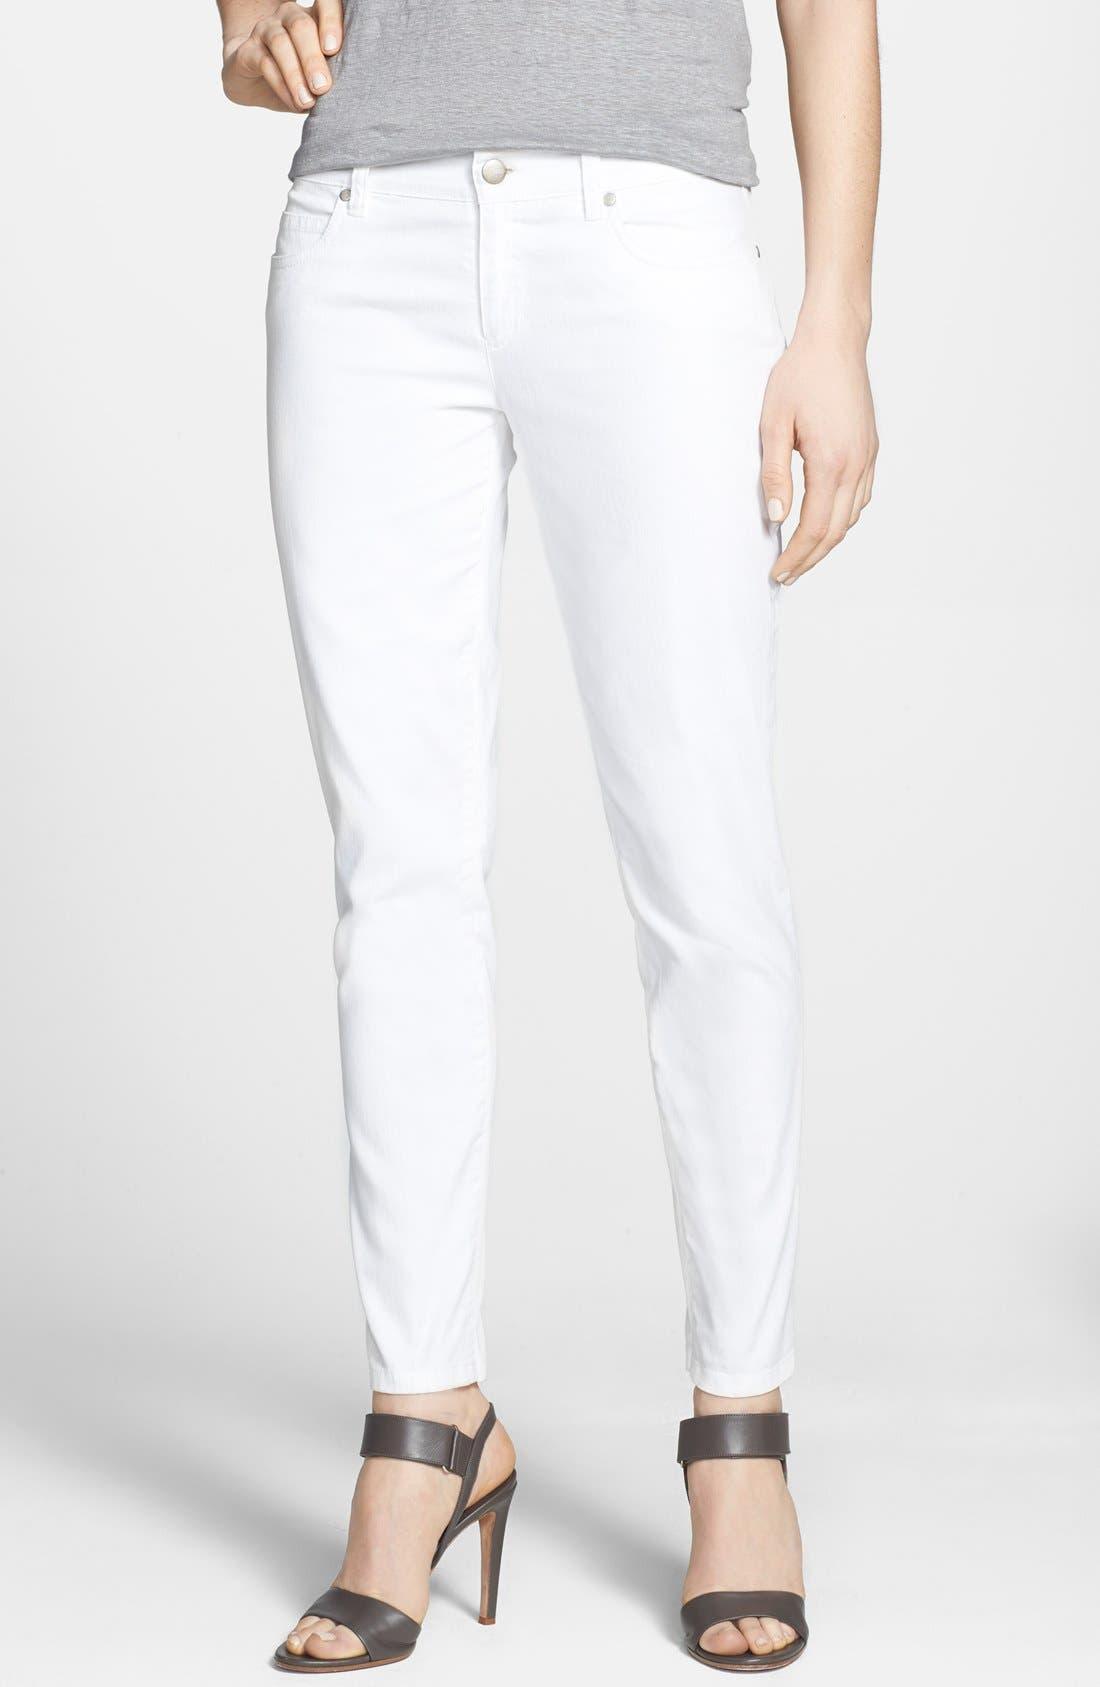 Alternate Image 1 Selected - Eileen Fisher Stretch Denim Ankle Skinny Jeans (White) (Regular & Petite)